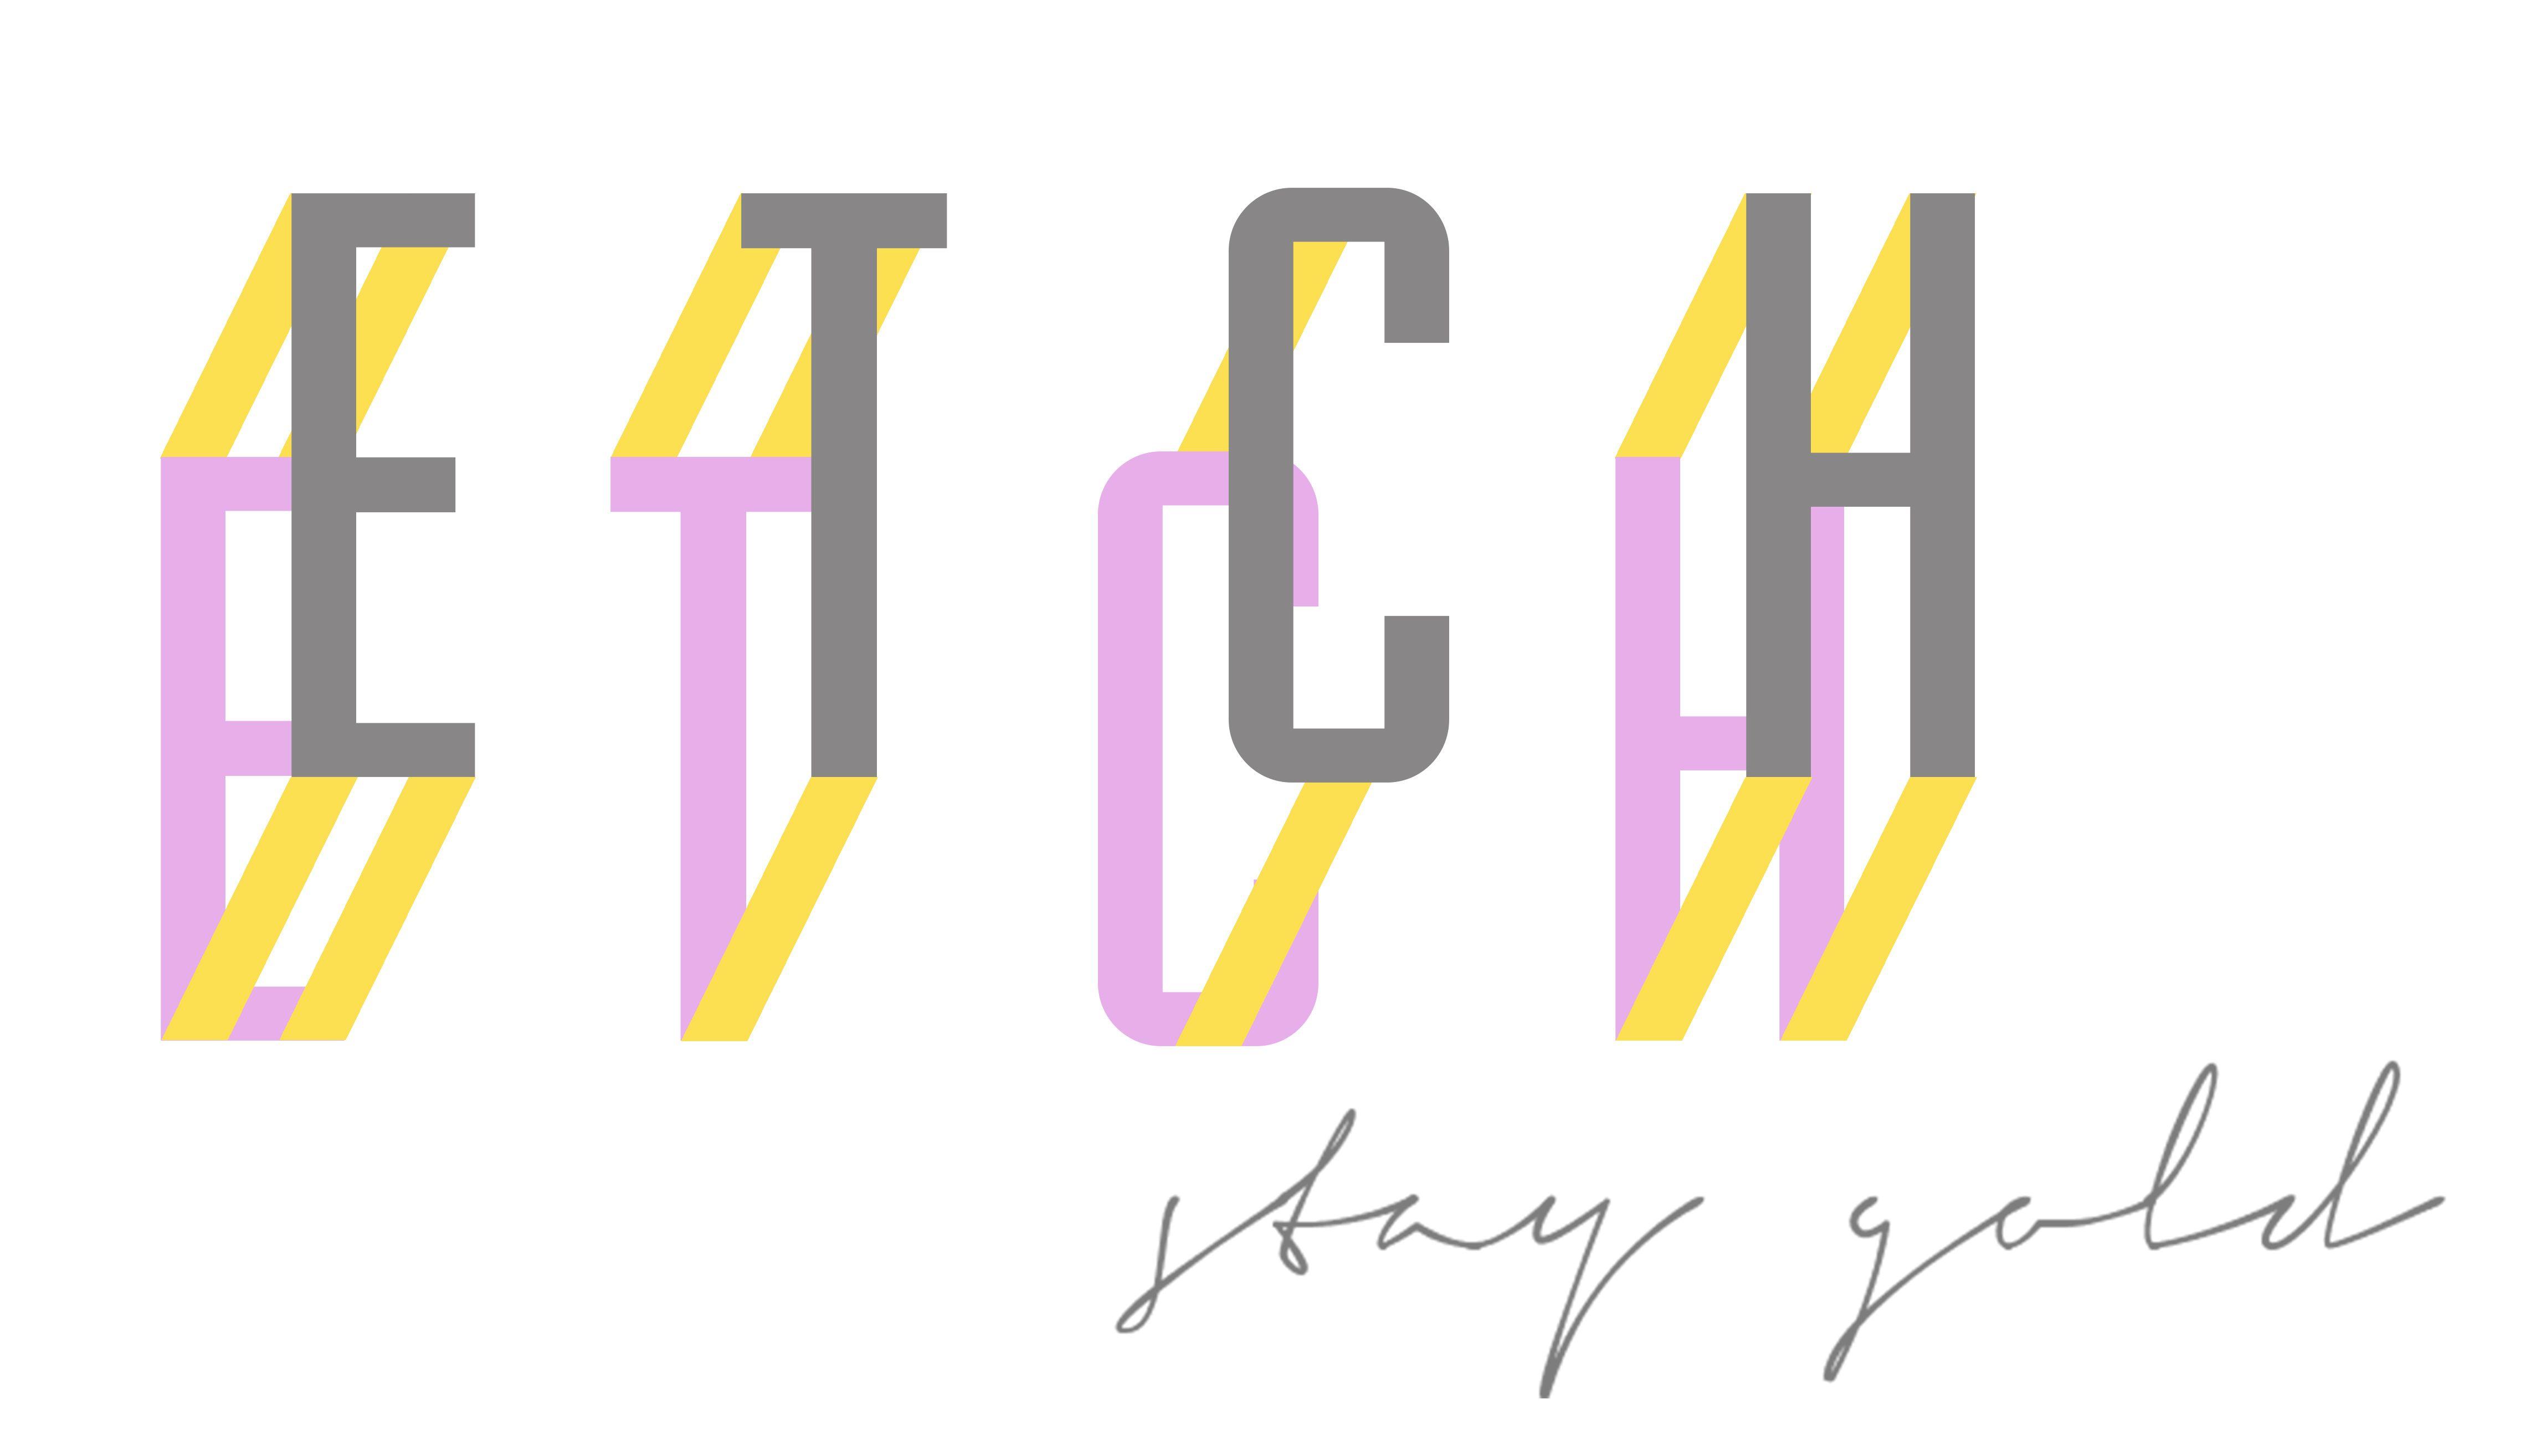 Studio logo, Logos, Typography design